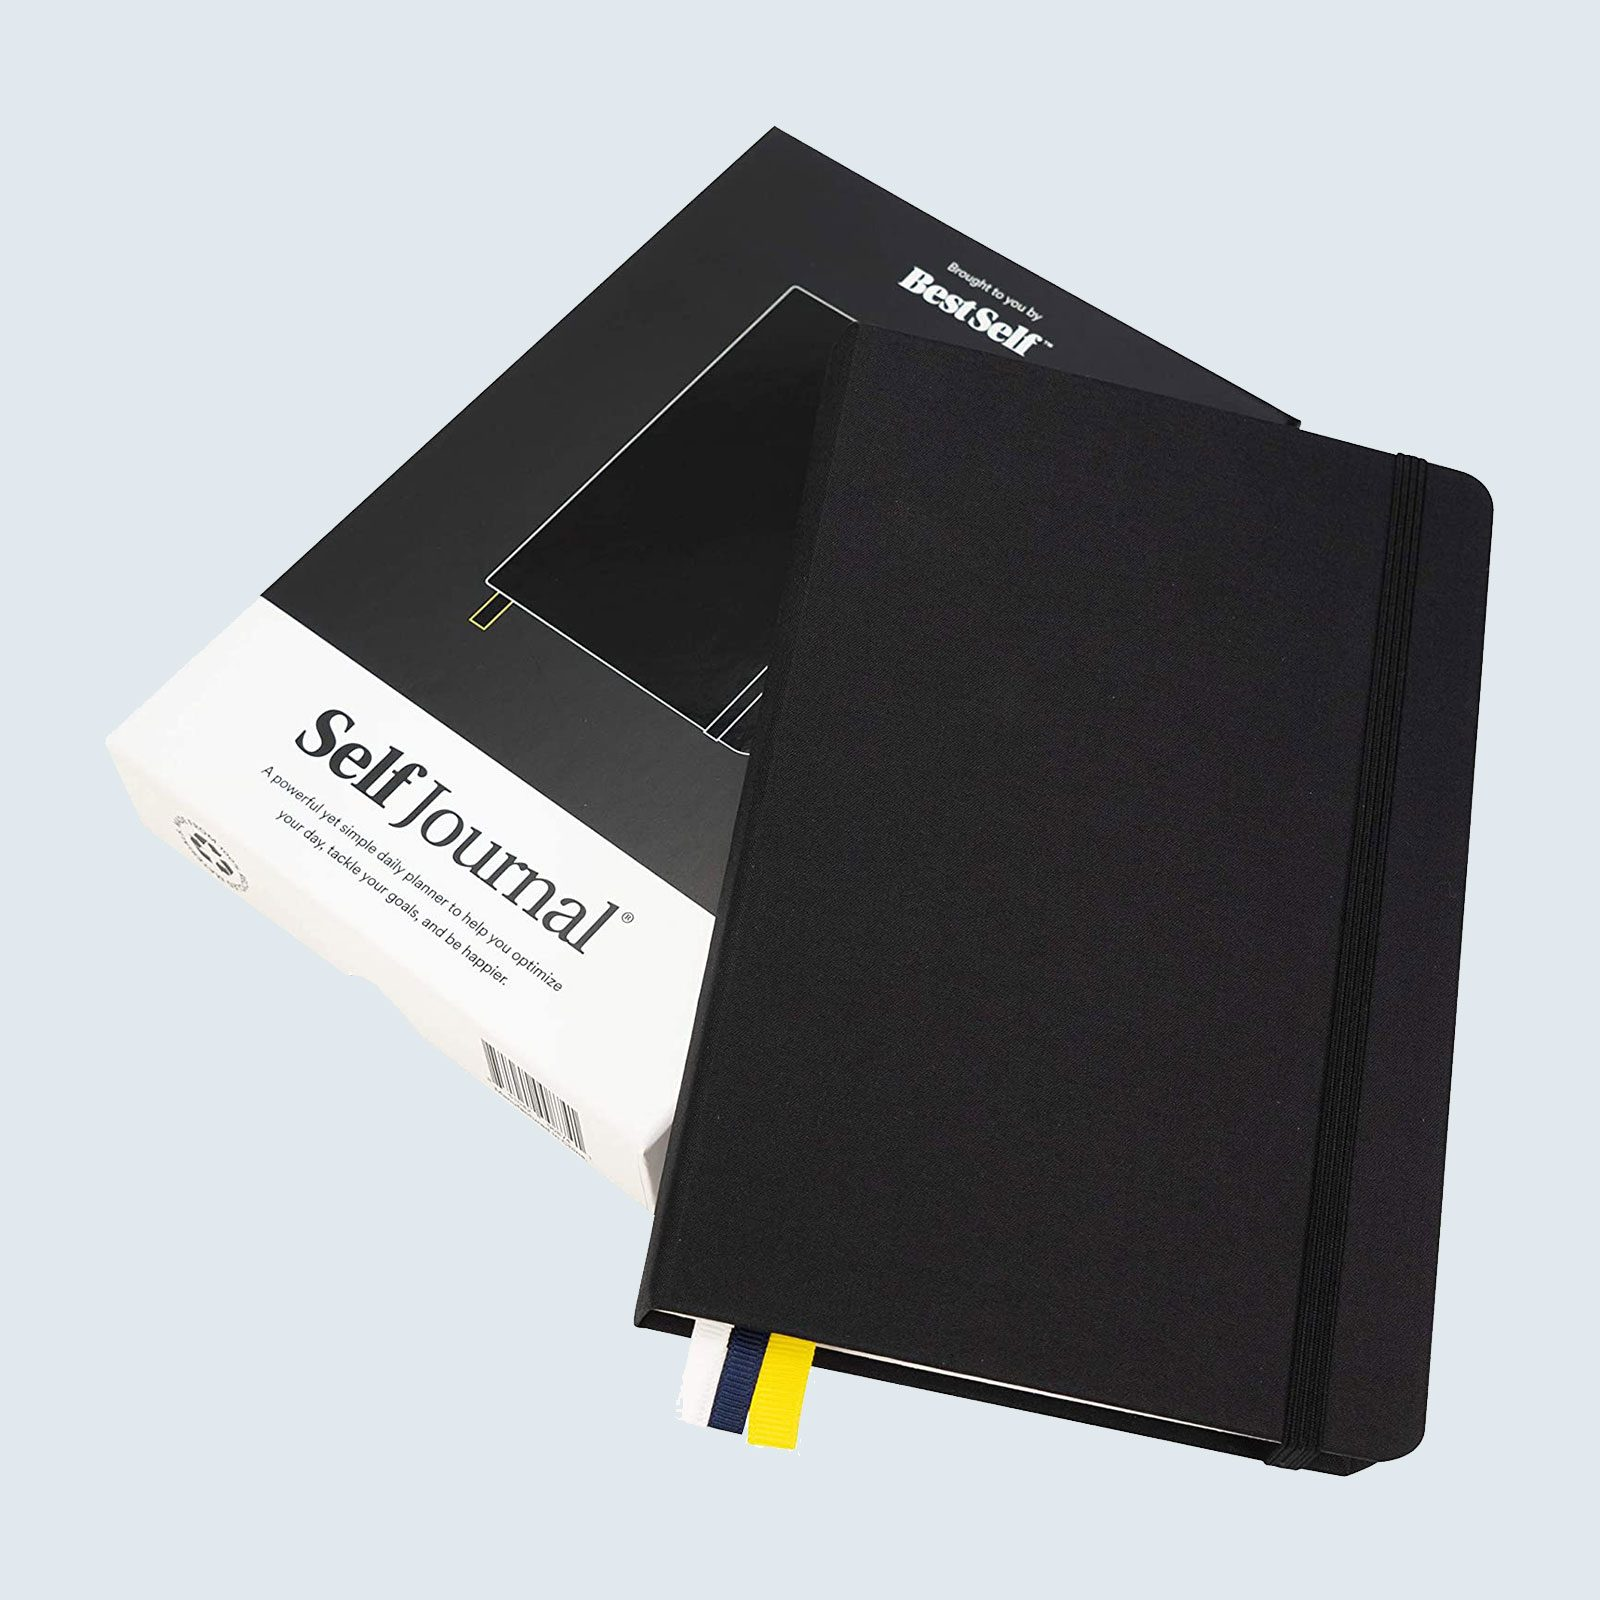 BestSelf Co.'s Self Journal